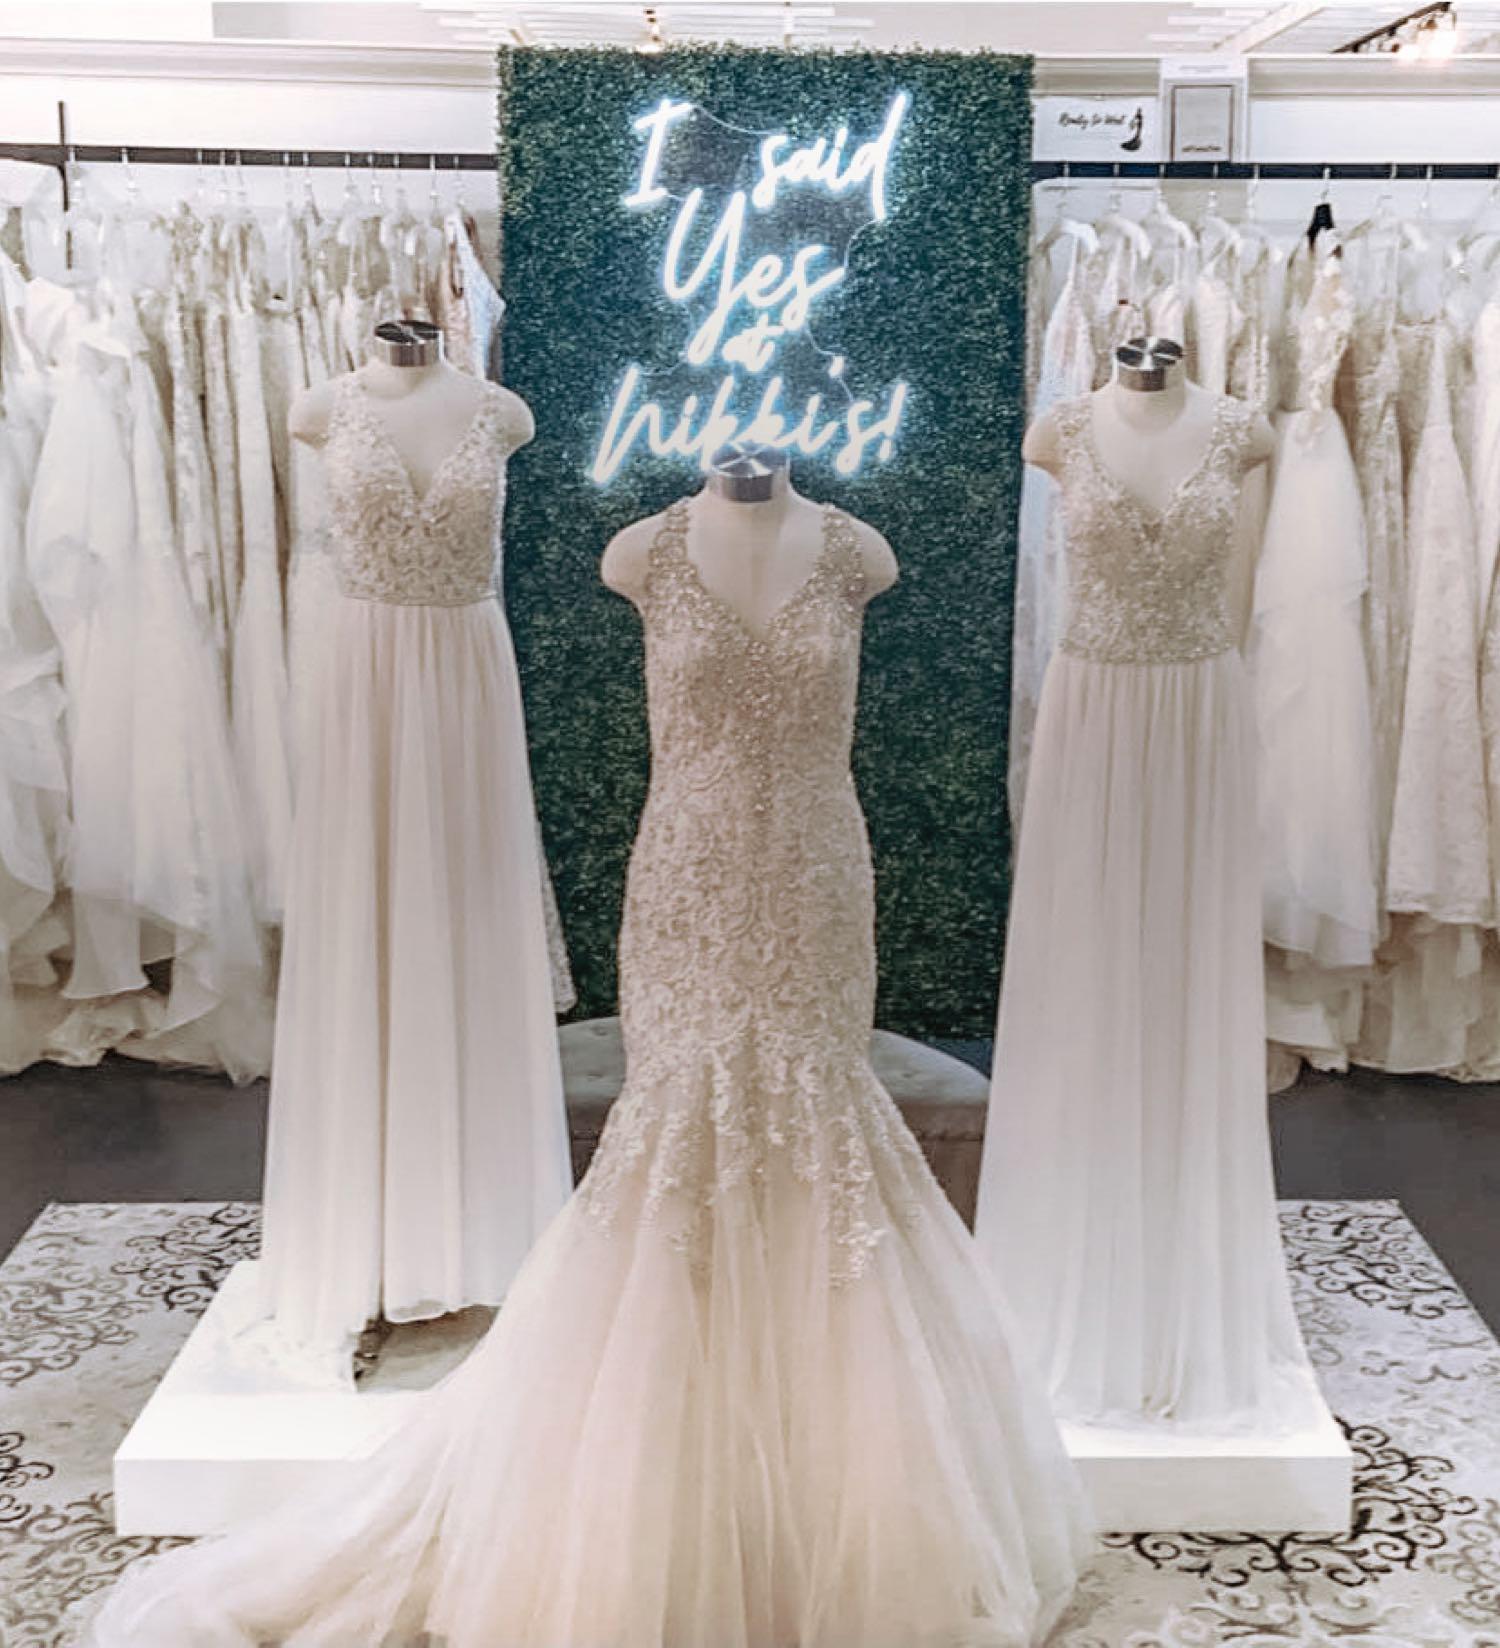 Models wearing white dresses. Mobile Image